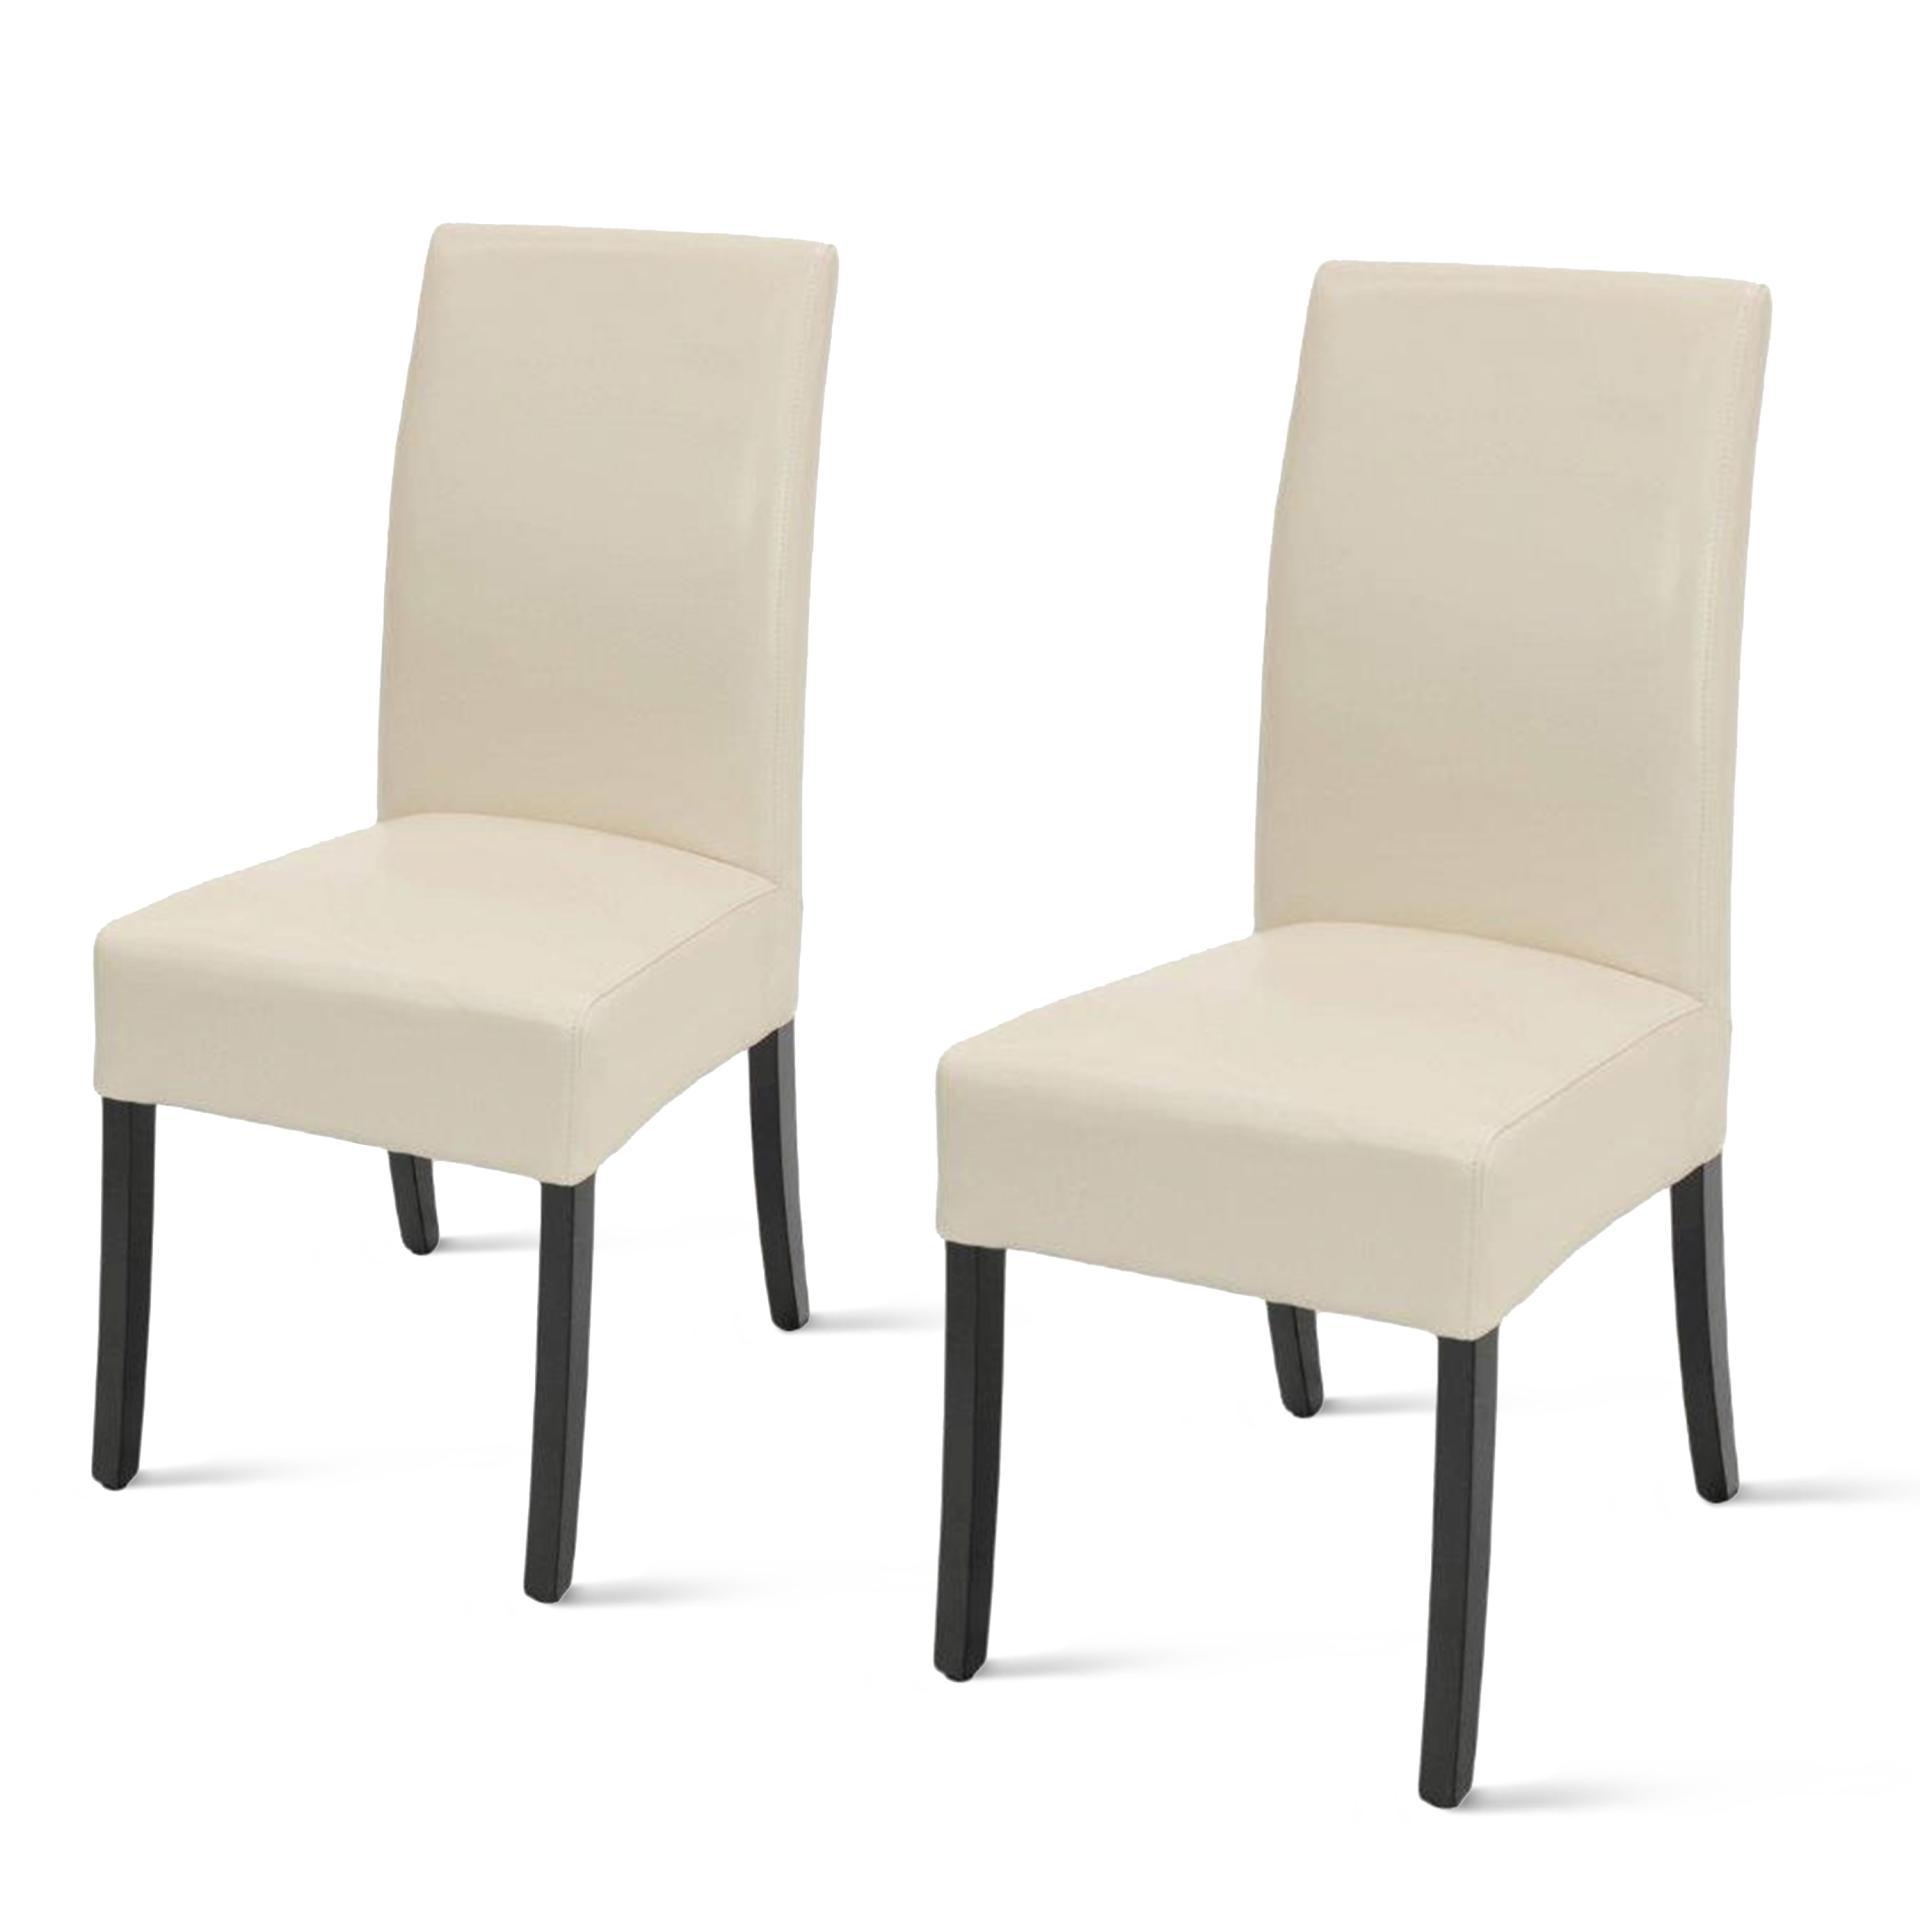 108239b 2050 Npd Furniture Stylish Amp Affordable